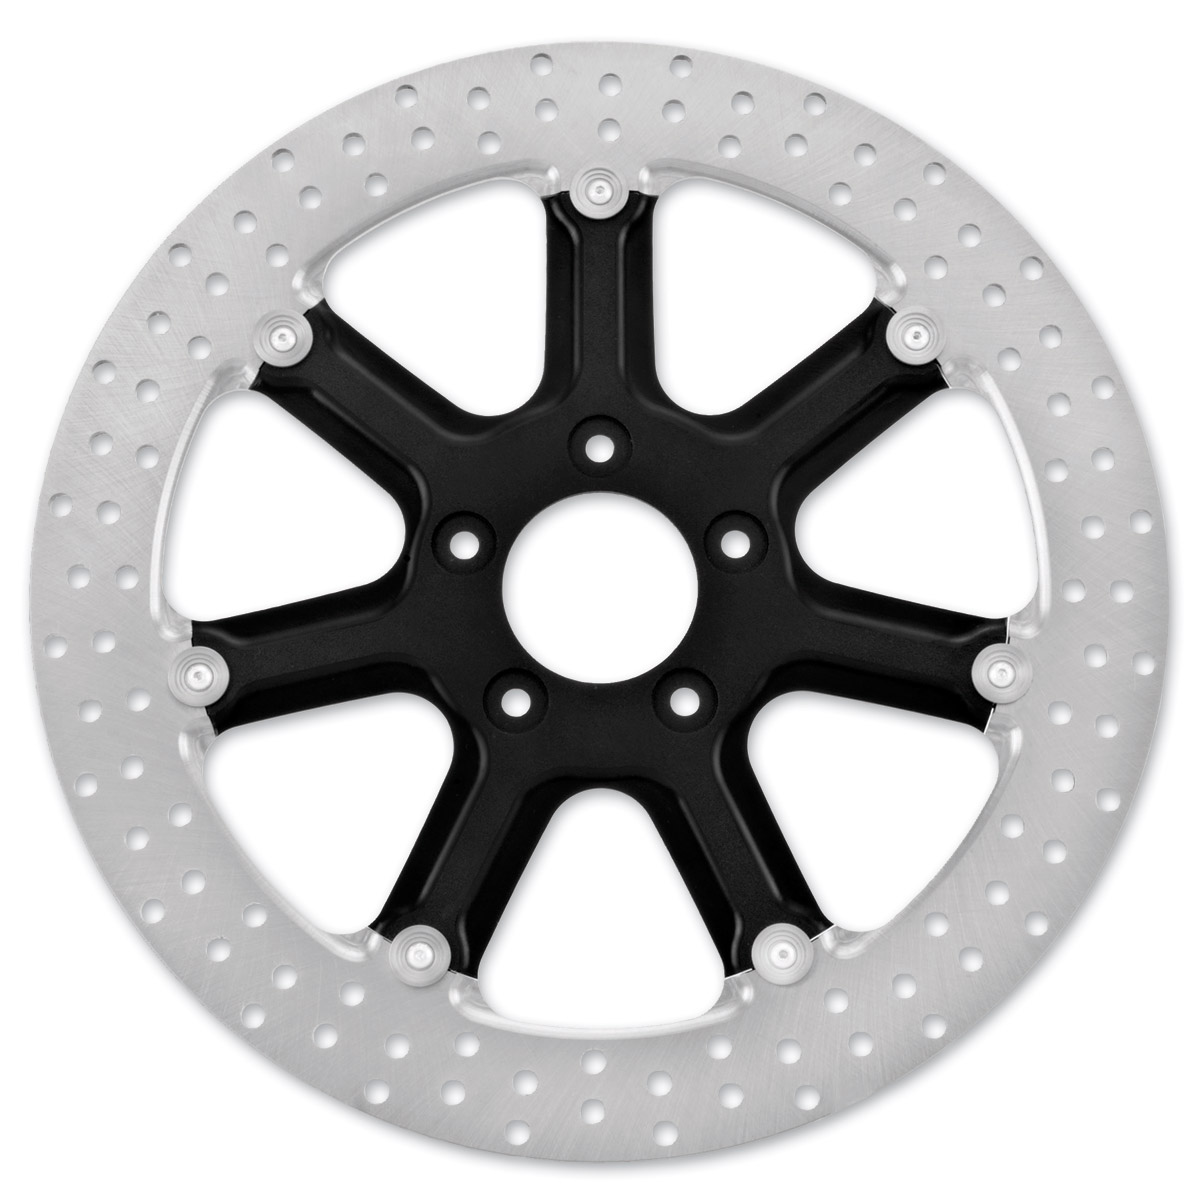 Performance Machine Rear Disc Rotor